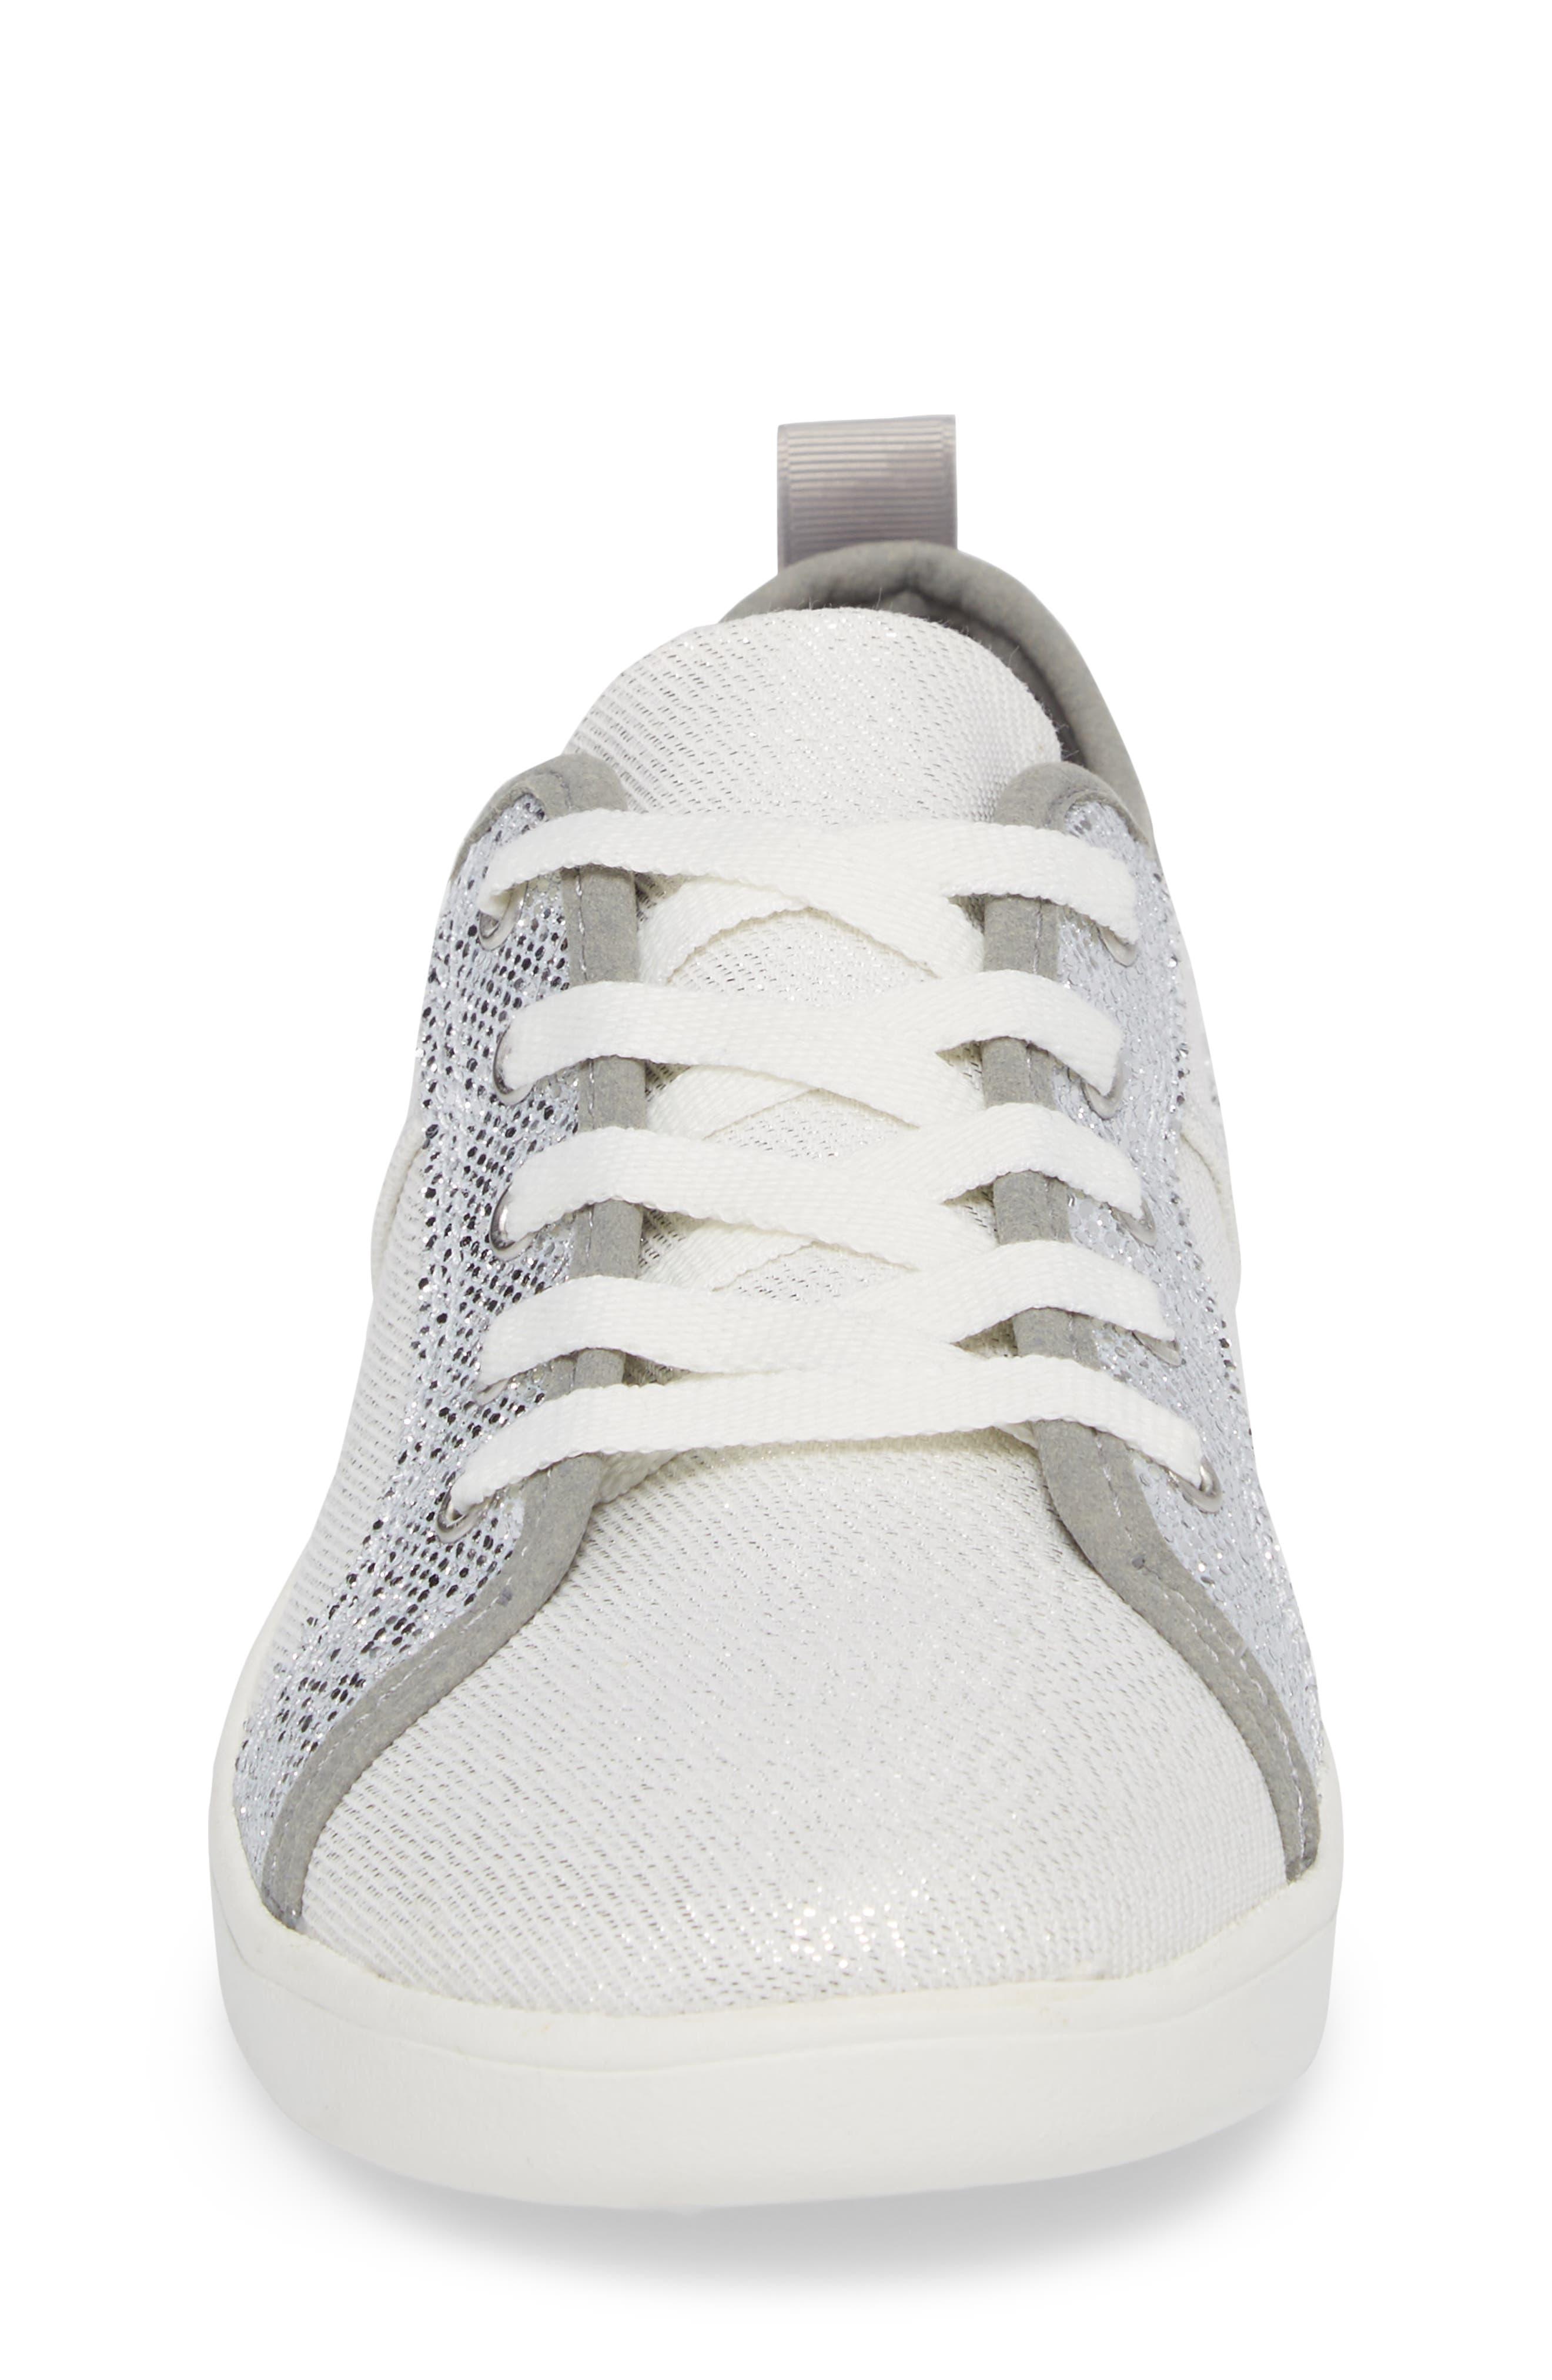 Irvin Sparkles Metallic Sneaker,                             Alternate thumbnail 4, color,                             SILVER